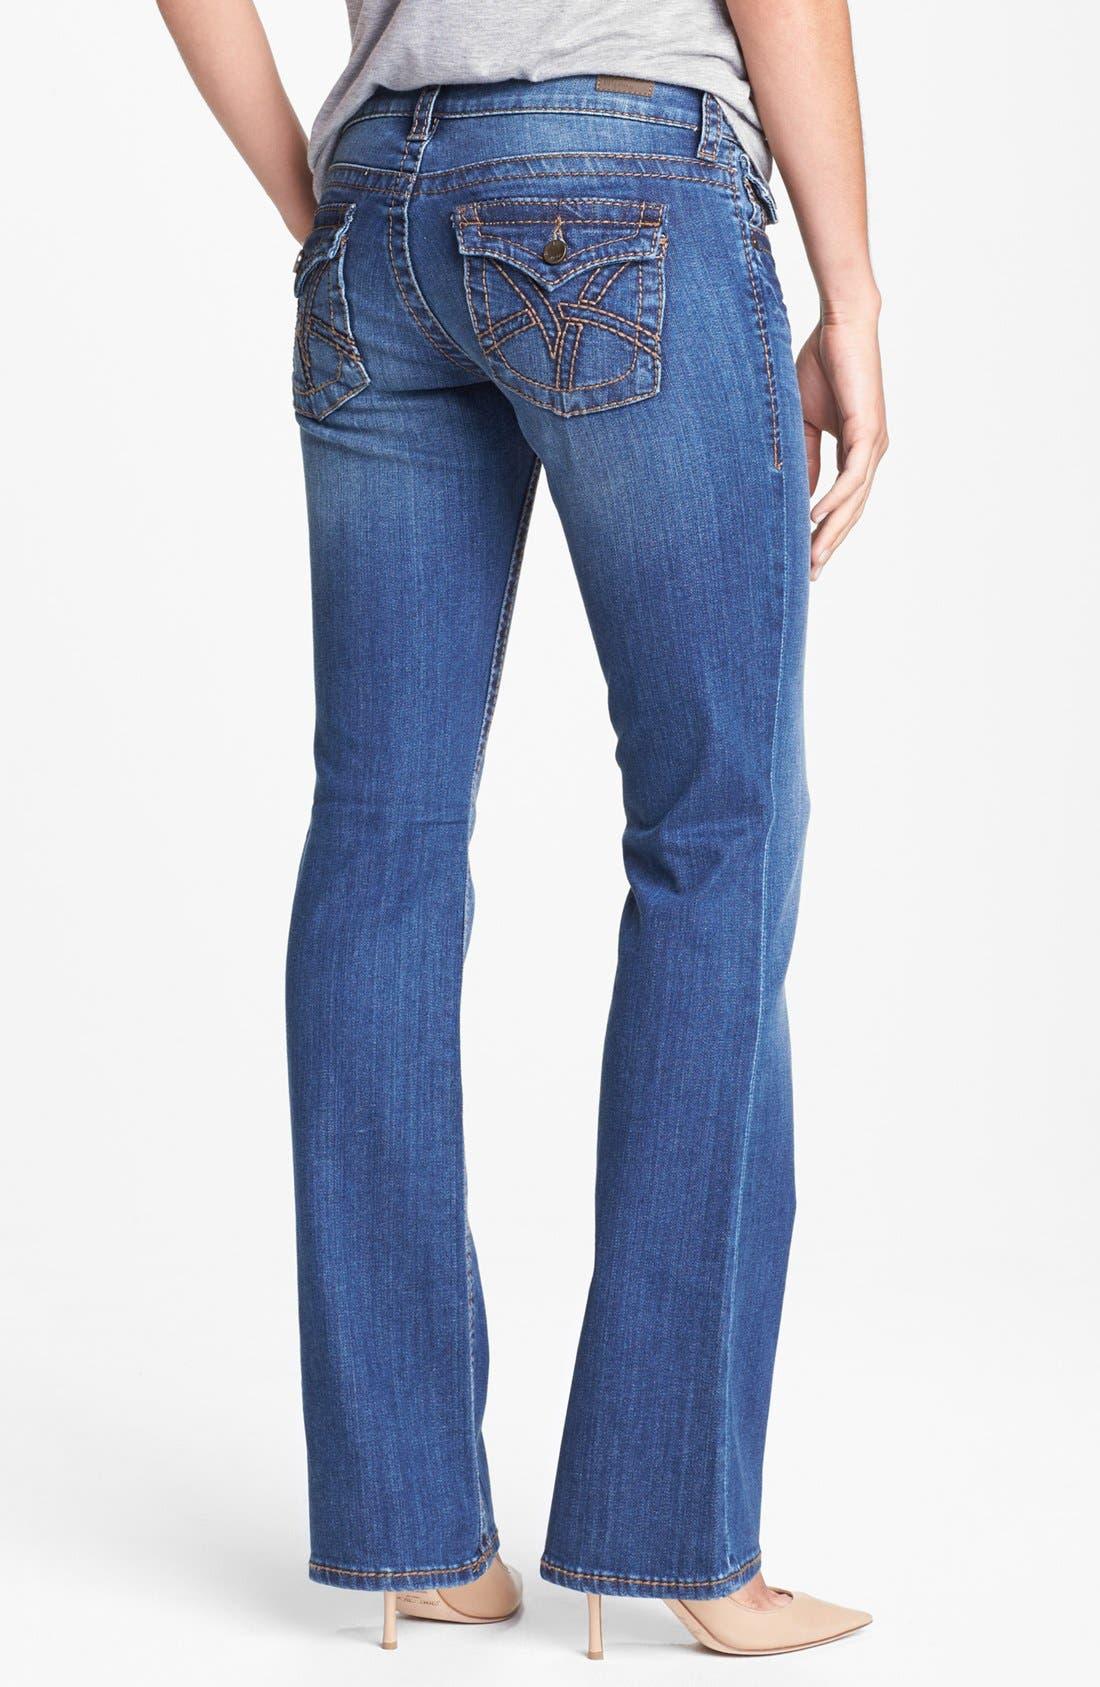 Alternate Image 2  - KUT from the Kloth 'Kate' Bootcut Jeans (Regular & Tall) (Abundance)